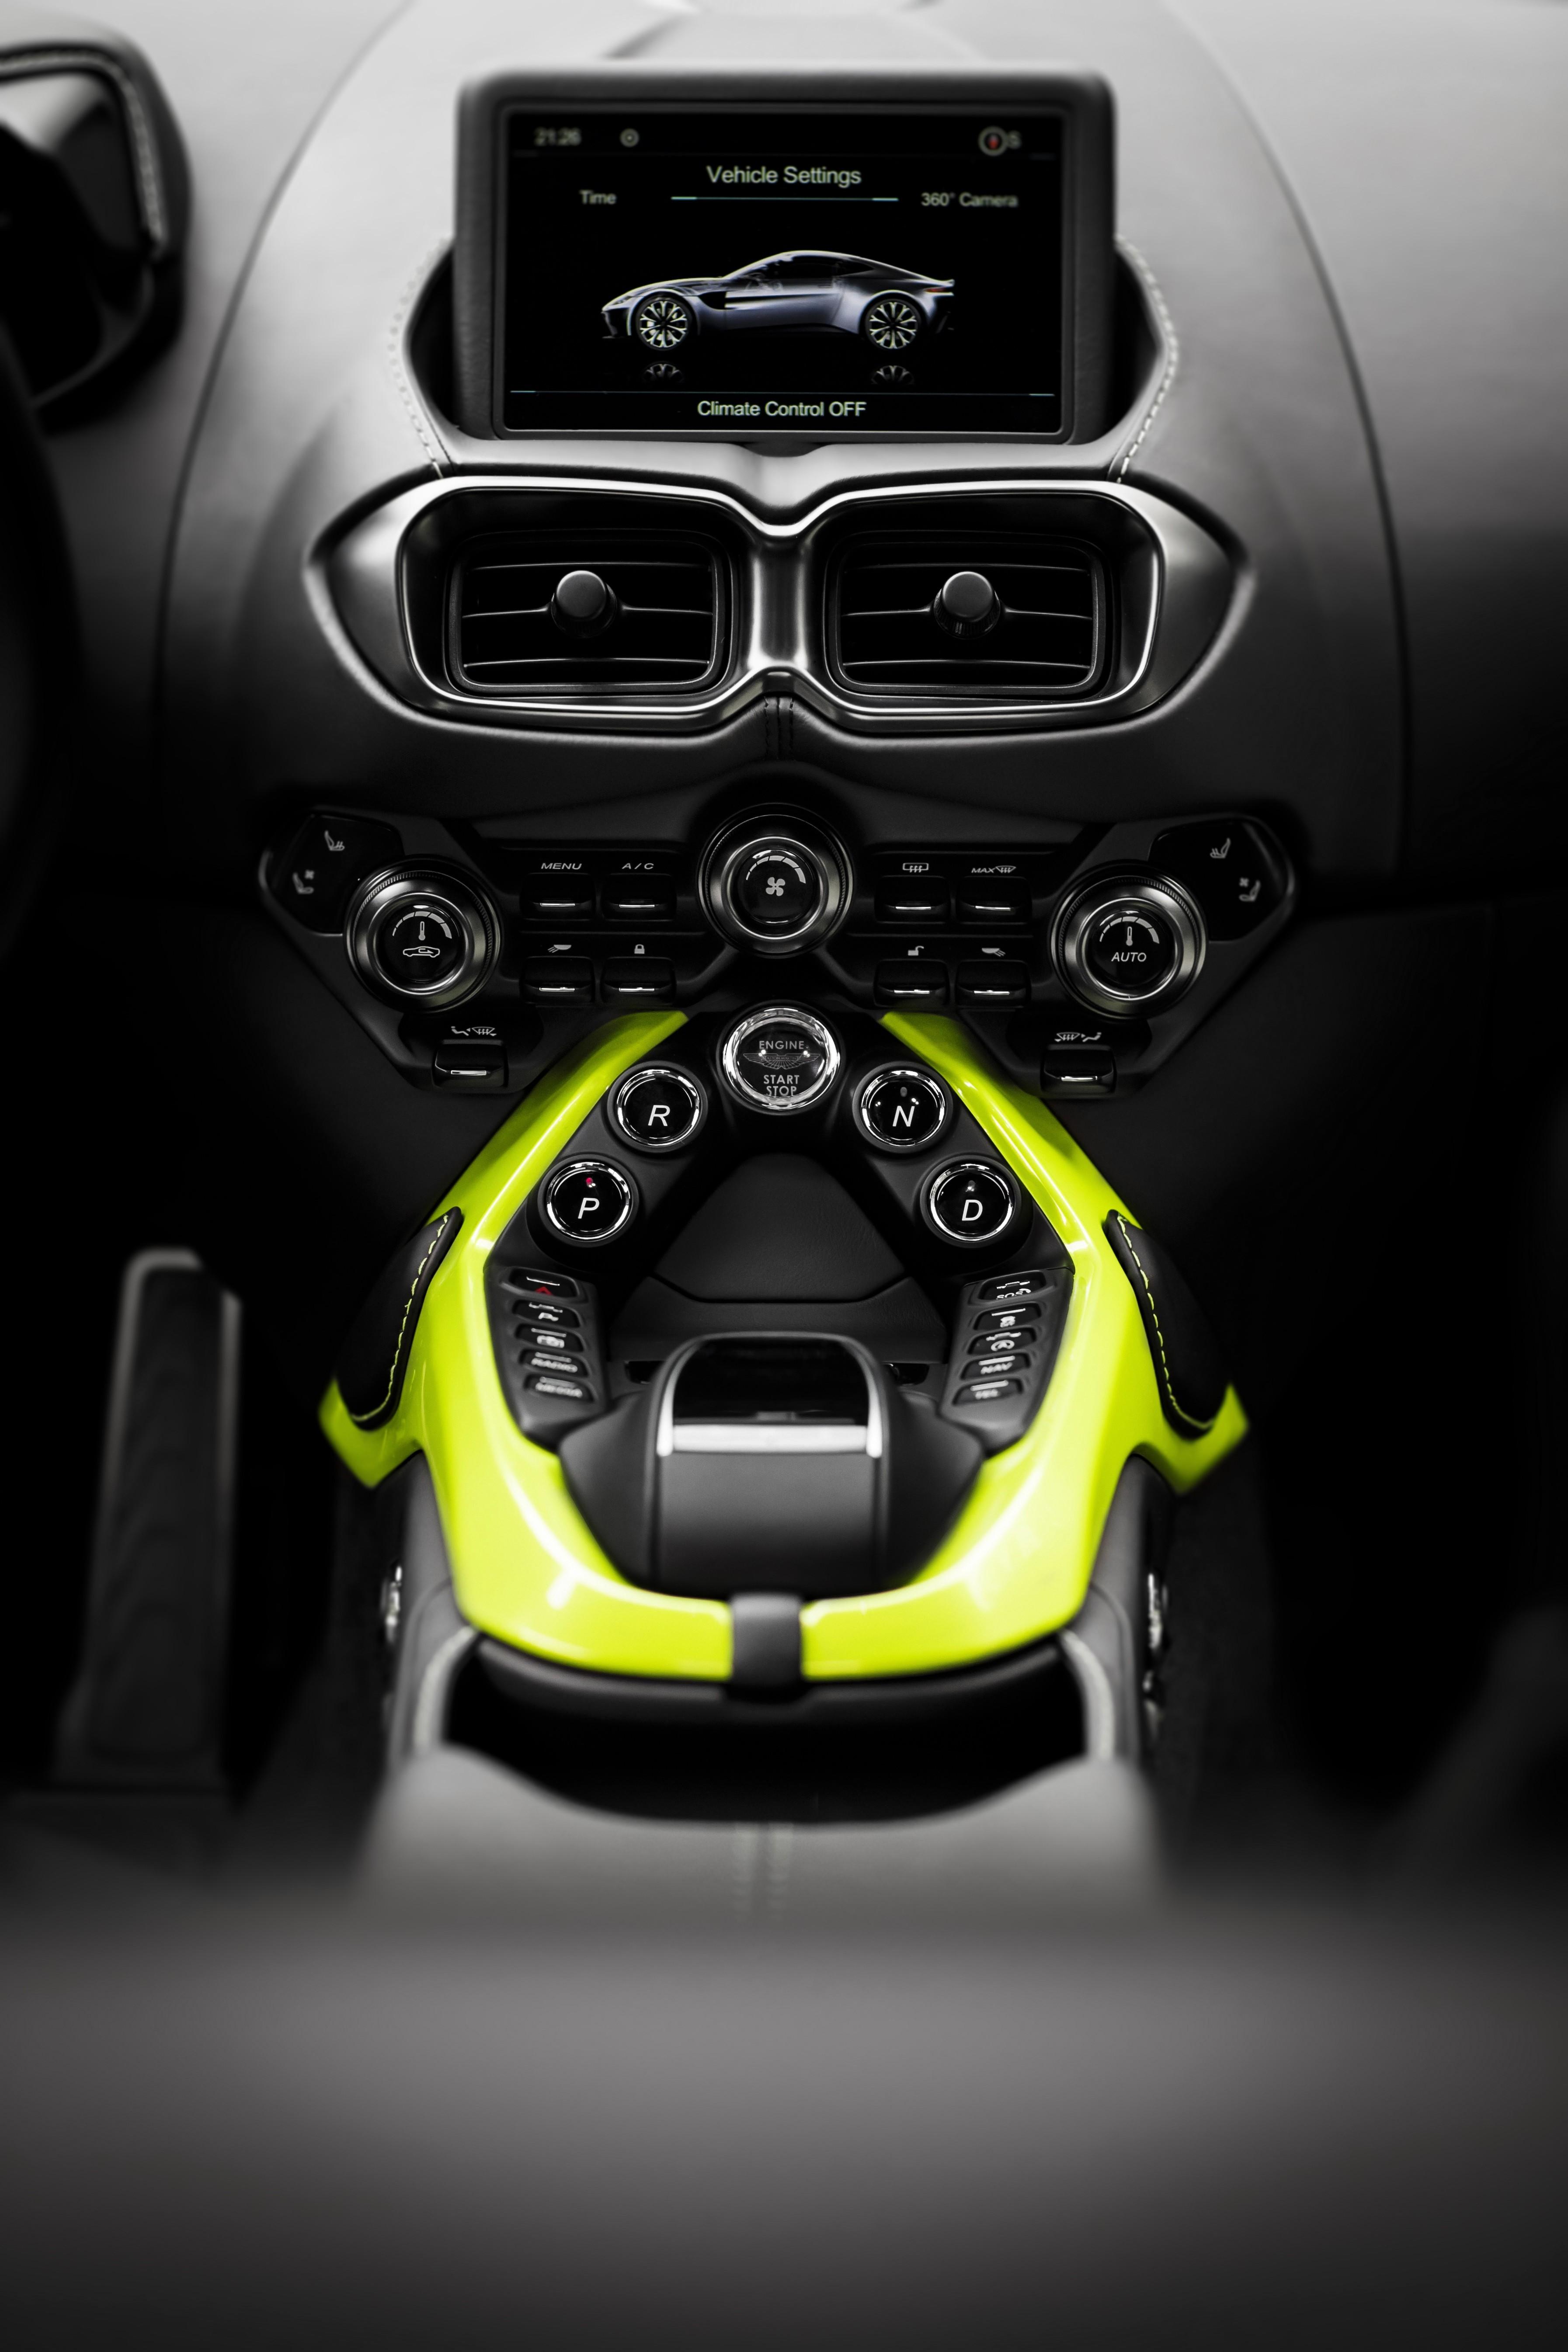 21 Century Auto >> Aston Martin V8 Vantage With Manual Transmission Coming In 2019 - autoevolution